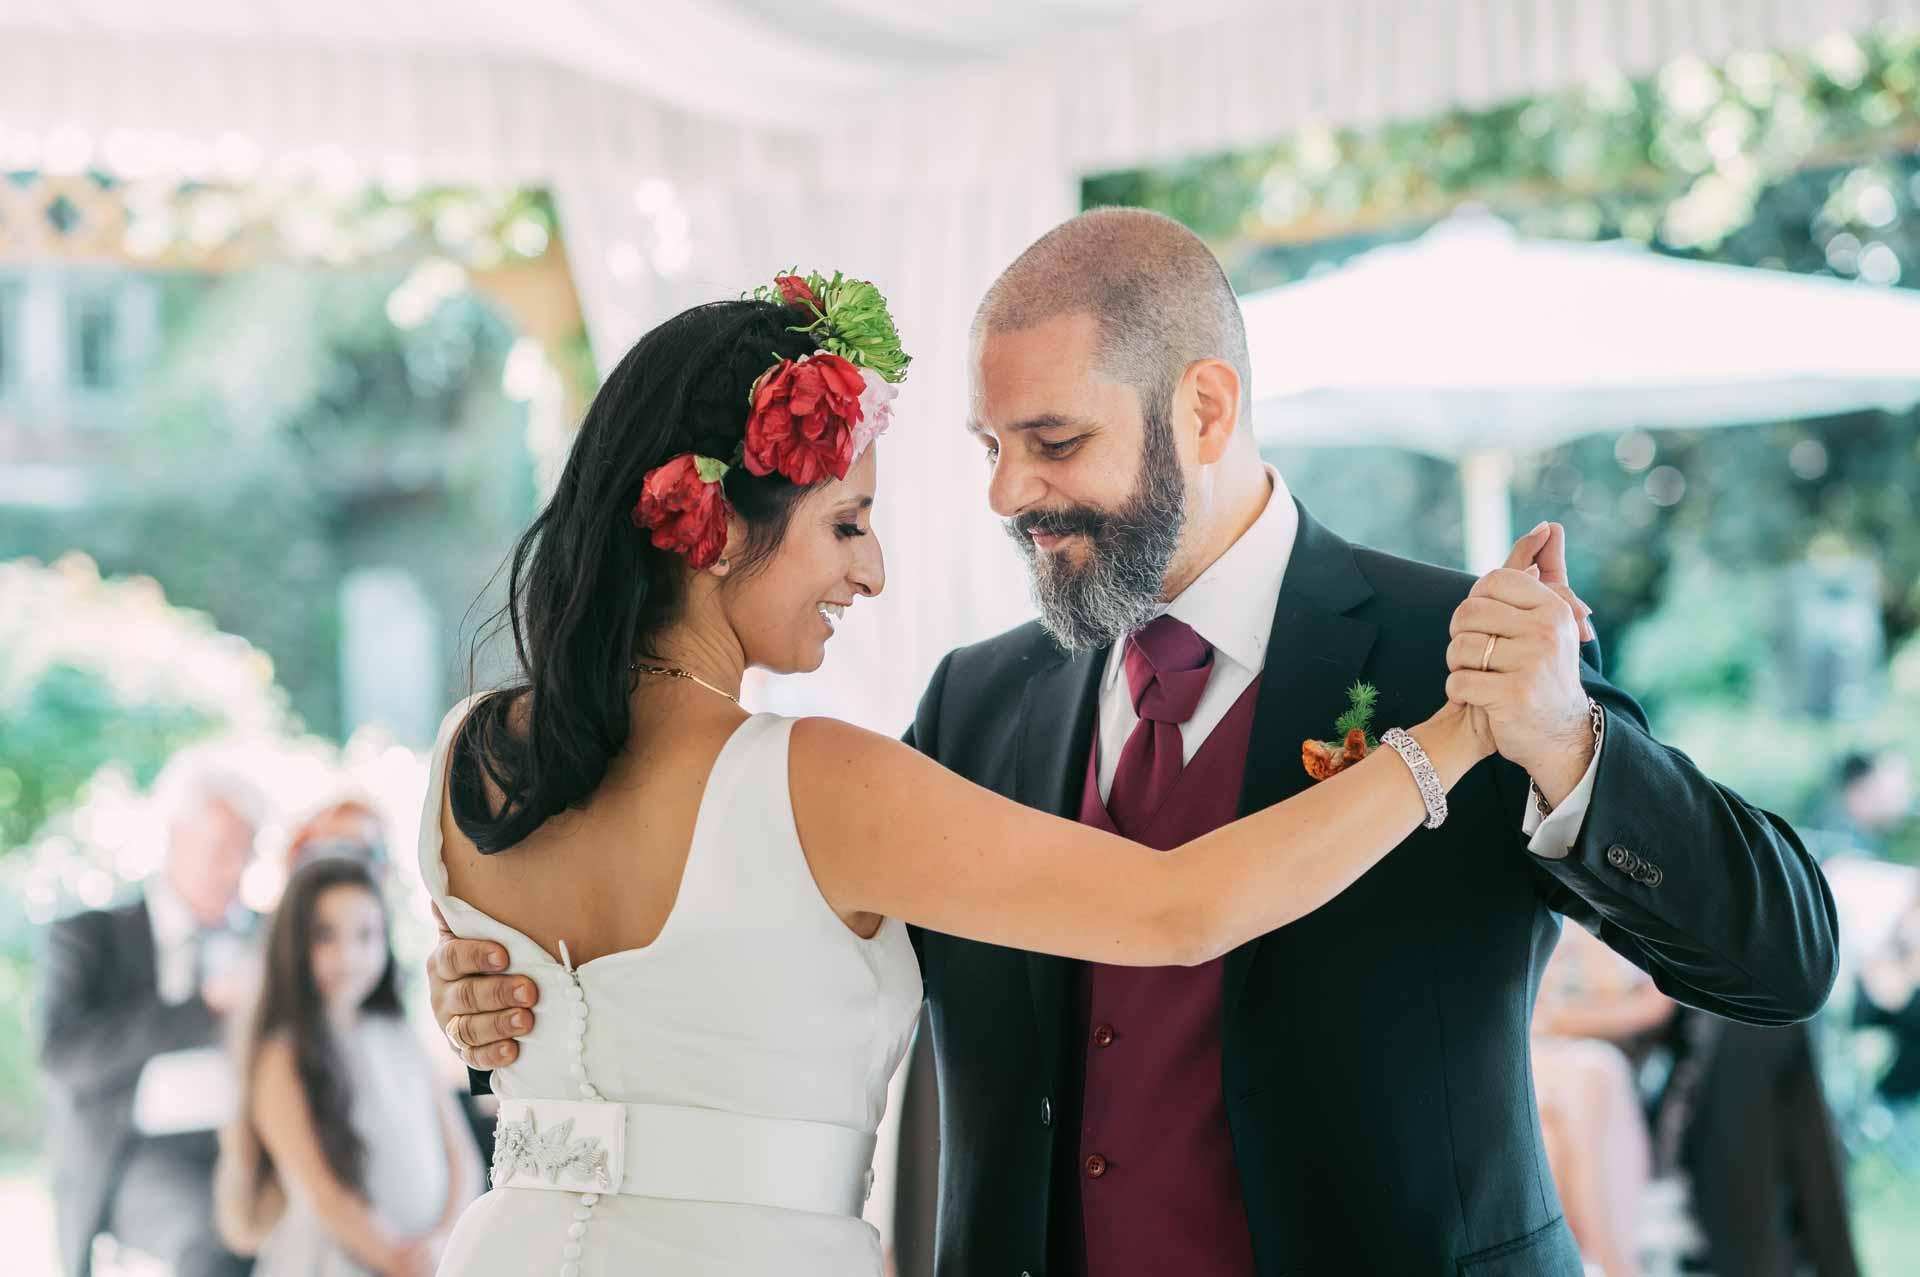 Fotografo-Matrimonio-Roma-Slide-i-66